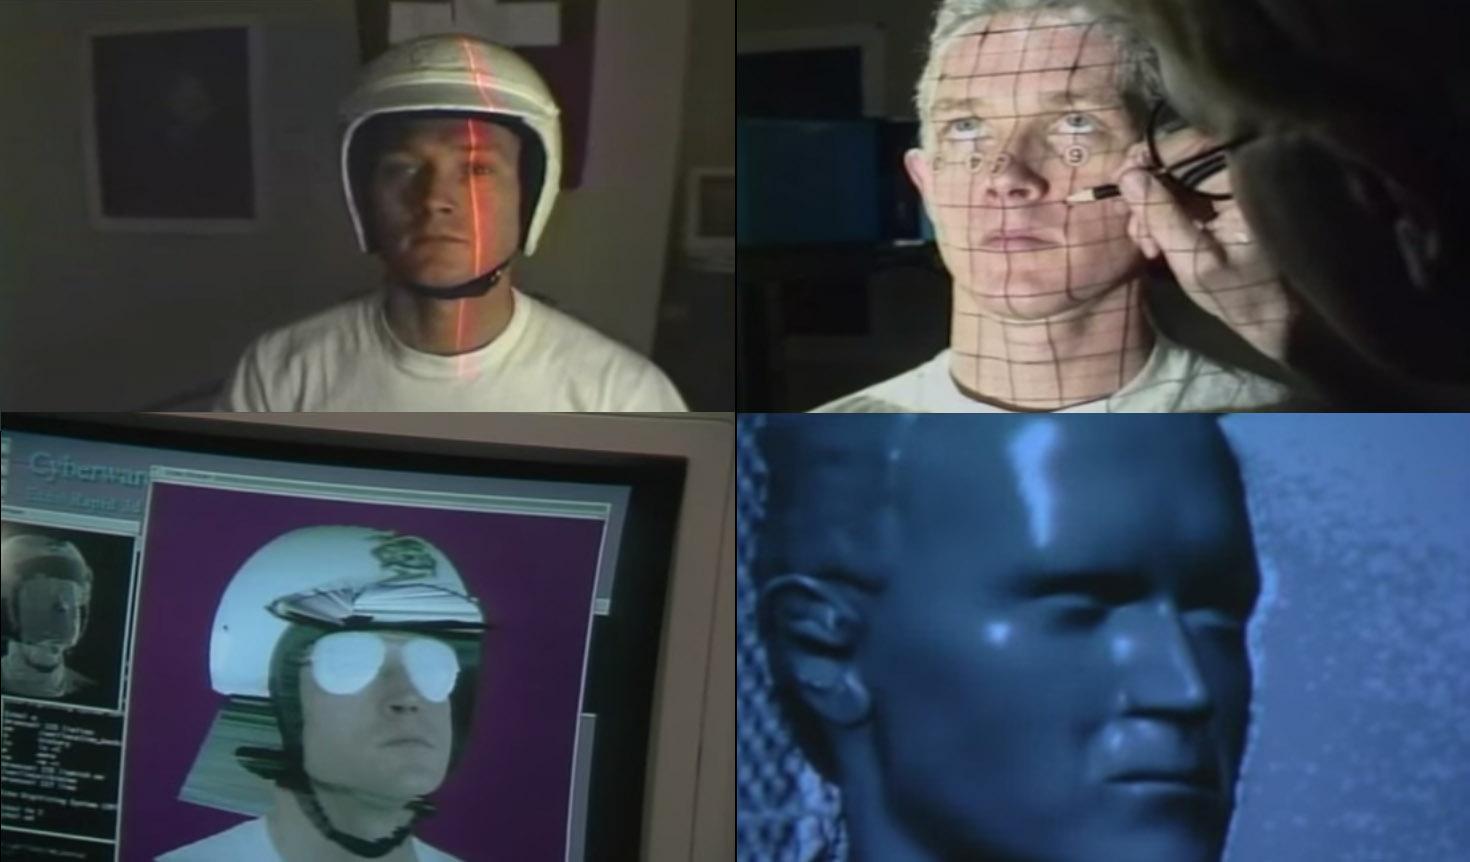 T1000的臉部模型透過掃描輸入軟體